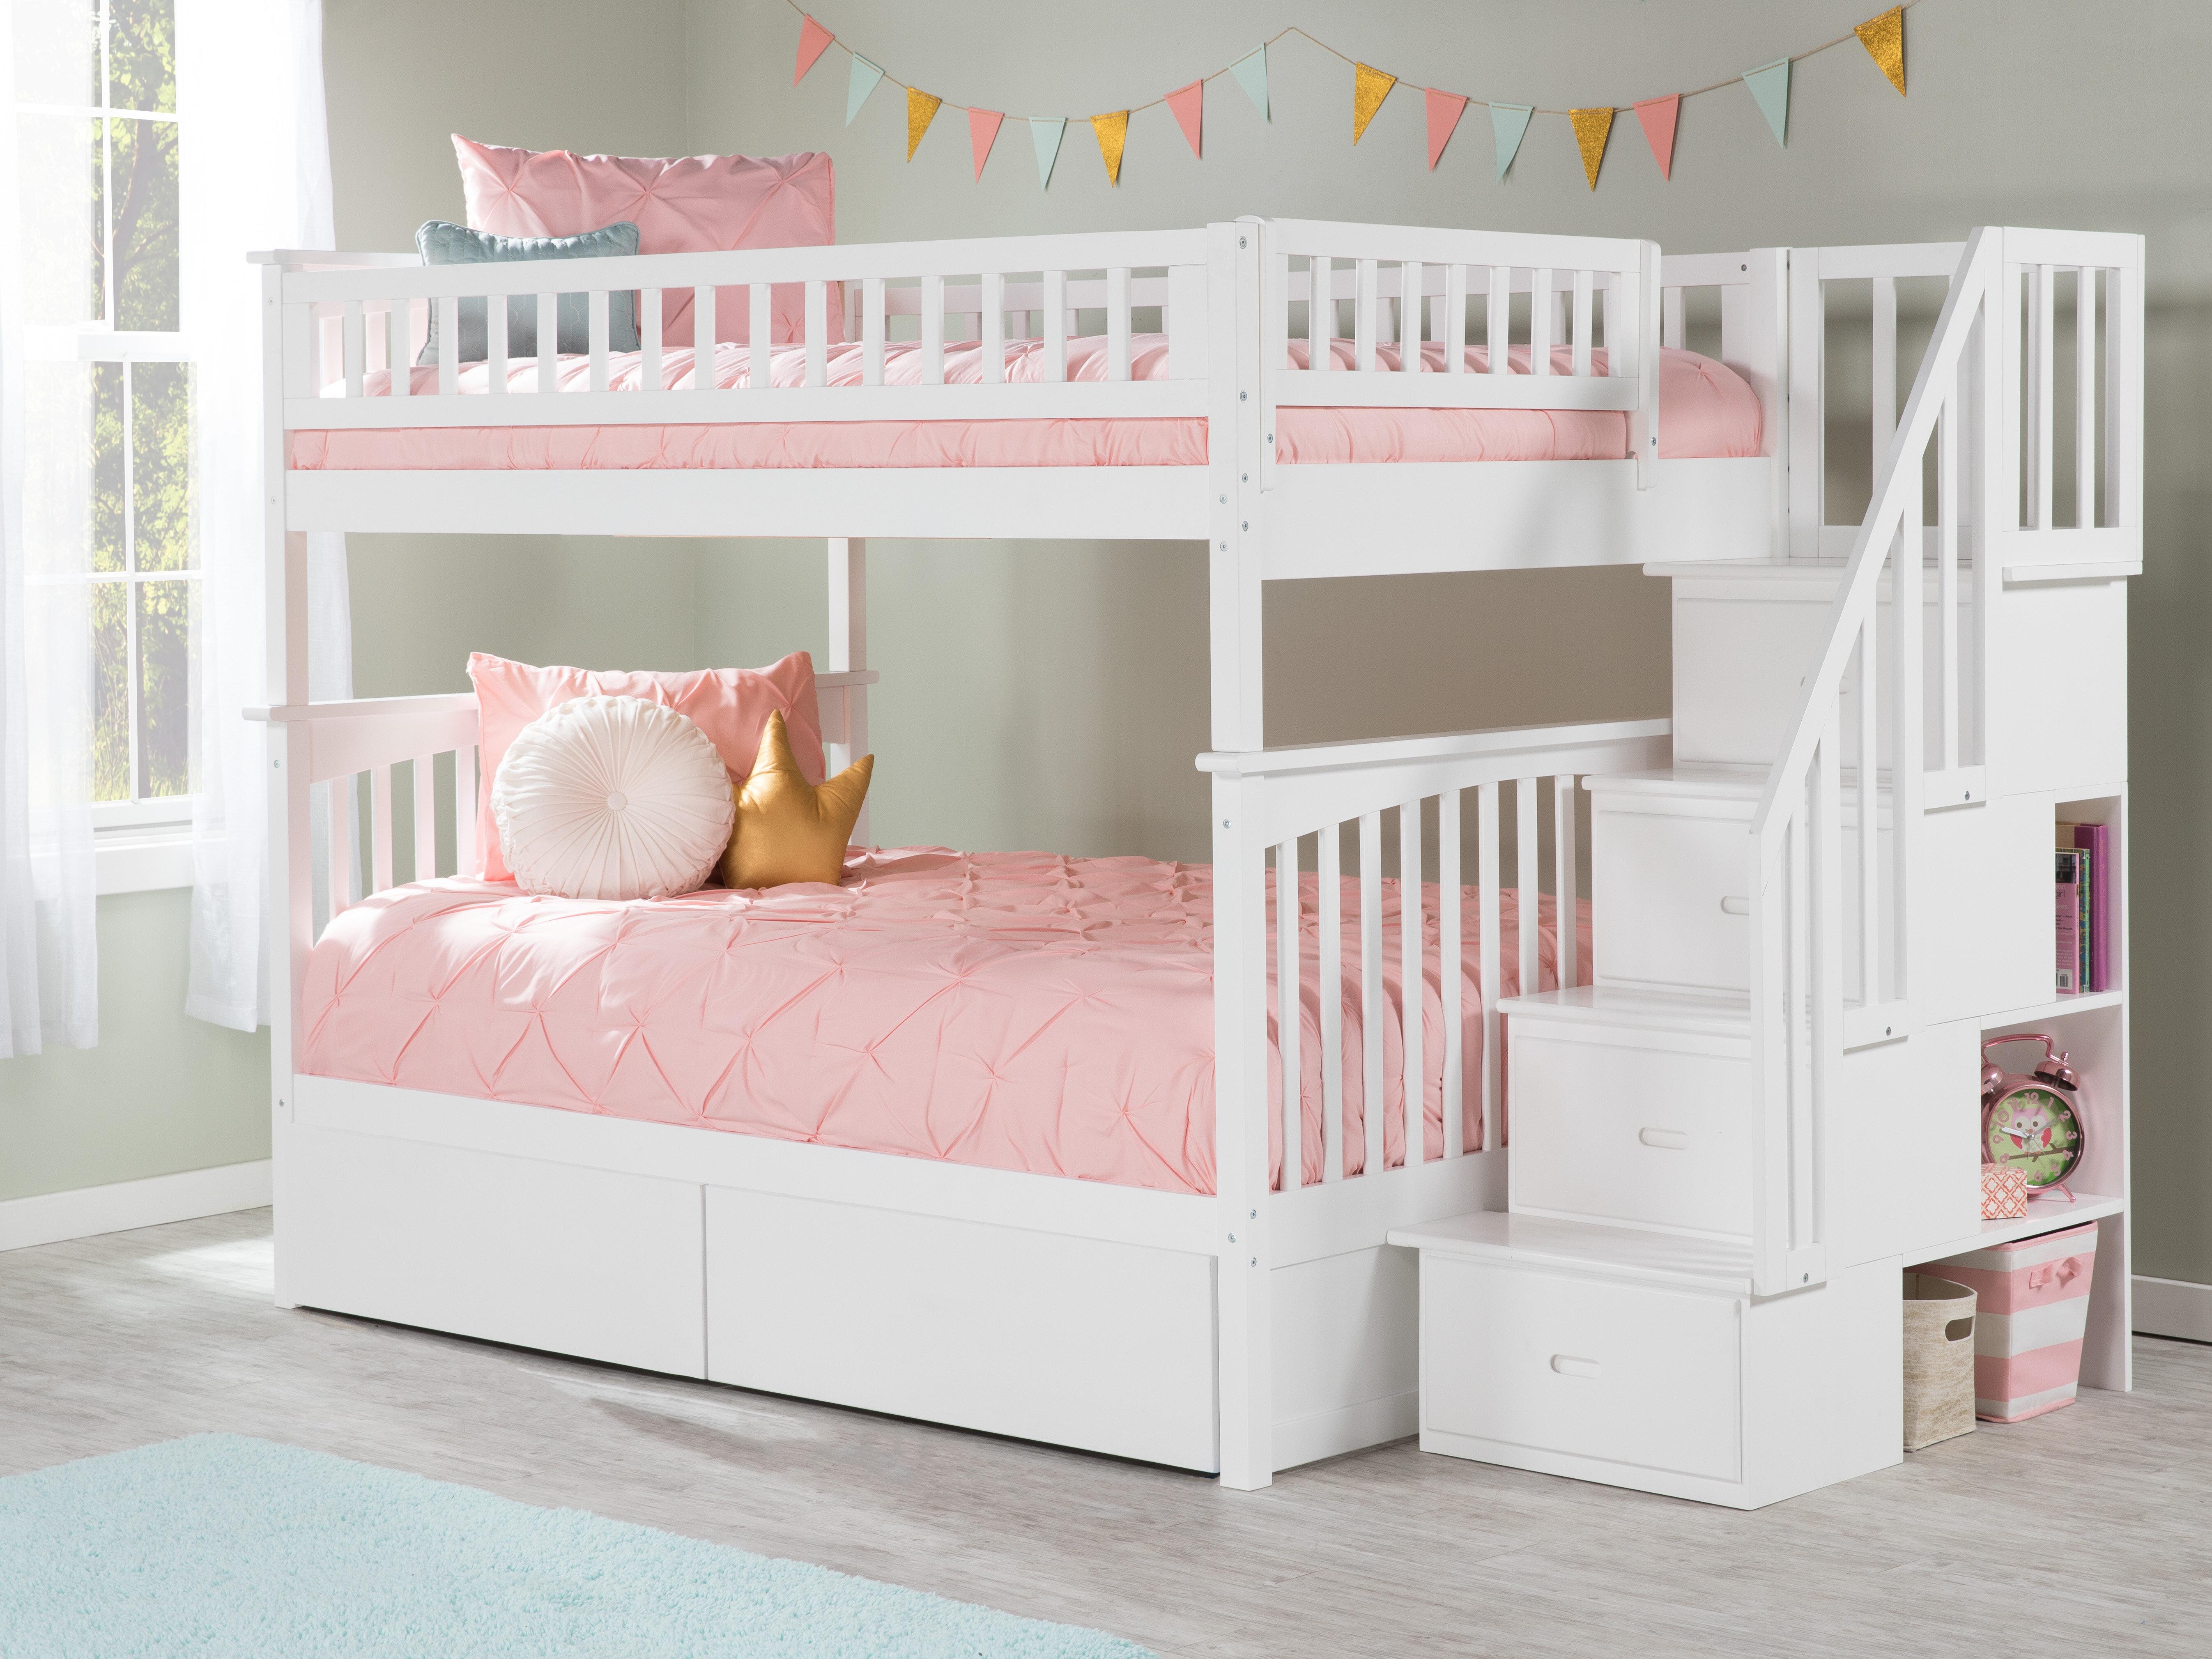 Harriet Bee Abel Full Over Full Solid Wood Standard Bunk Bed By Harriet Bee Reviews Wayfair